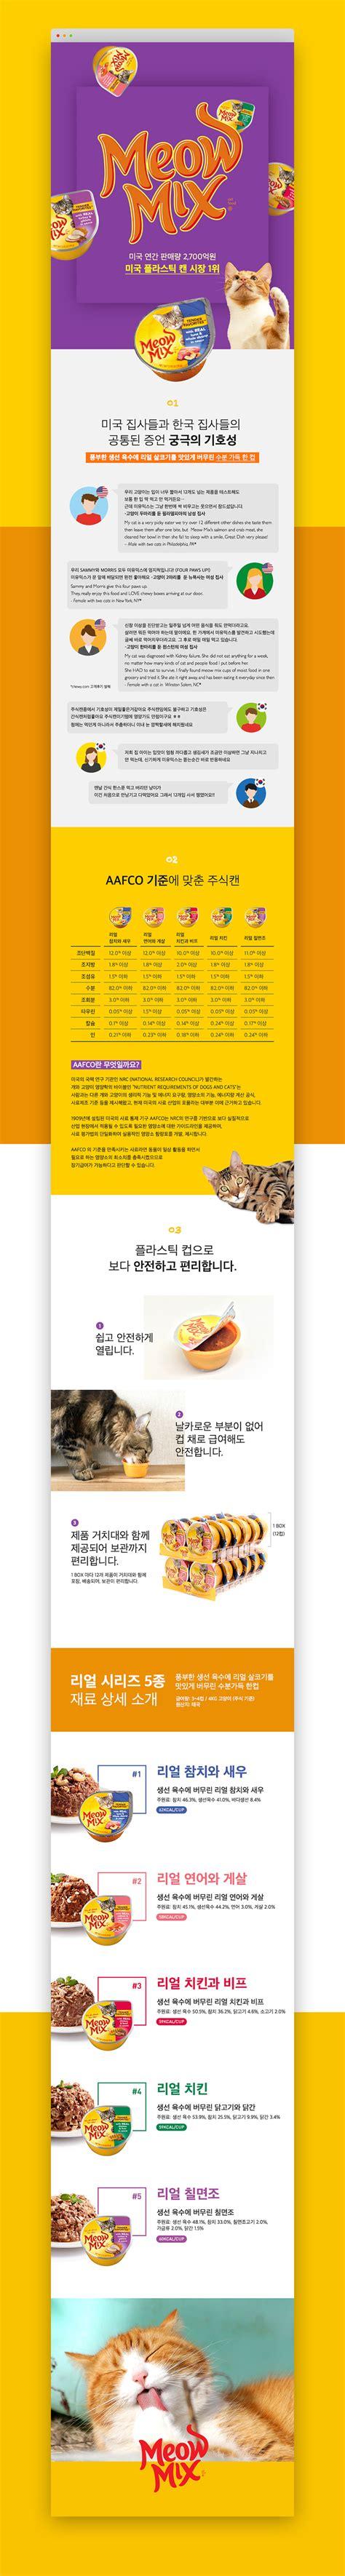 Meow Mix Kitten meow mix 상세페이지 pet food cat 고양이 kitten web 상세페이지